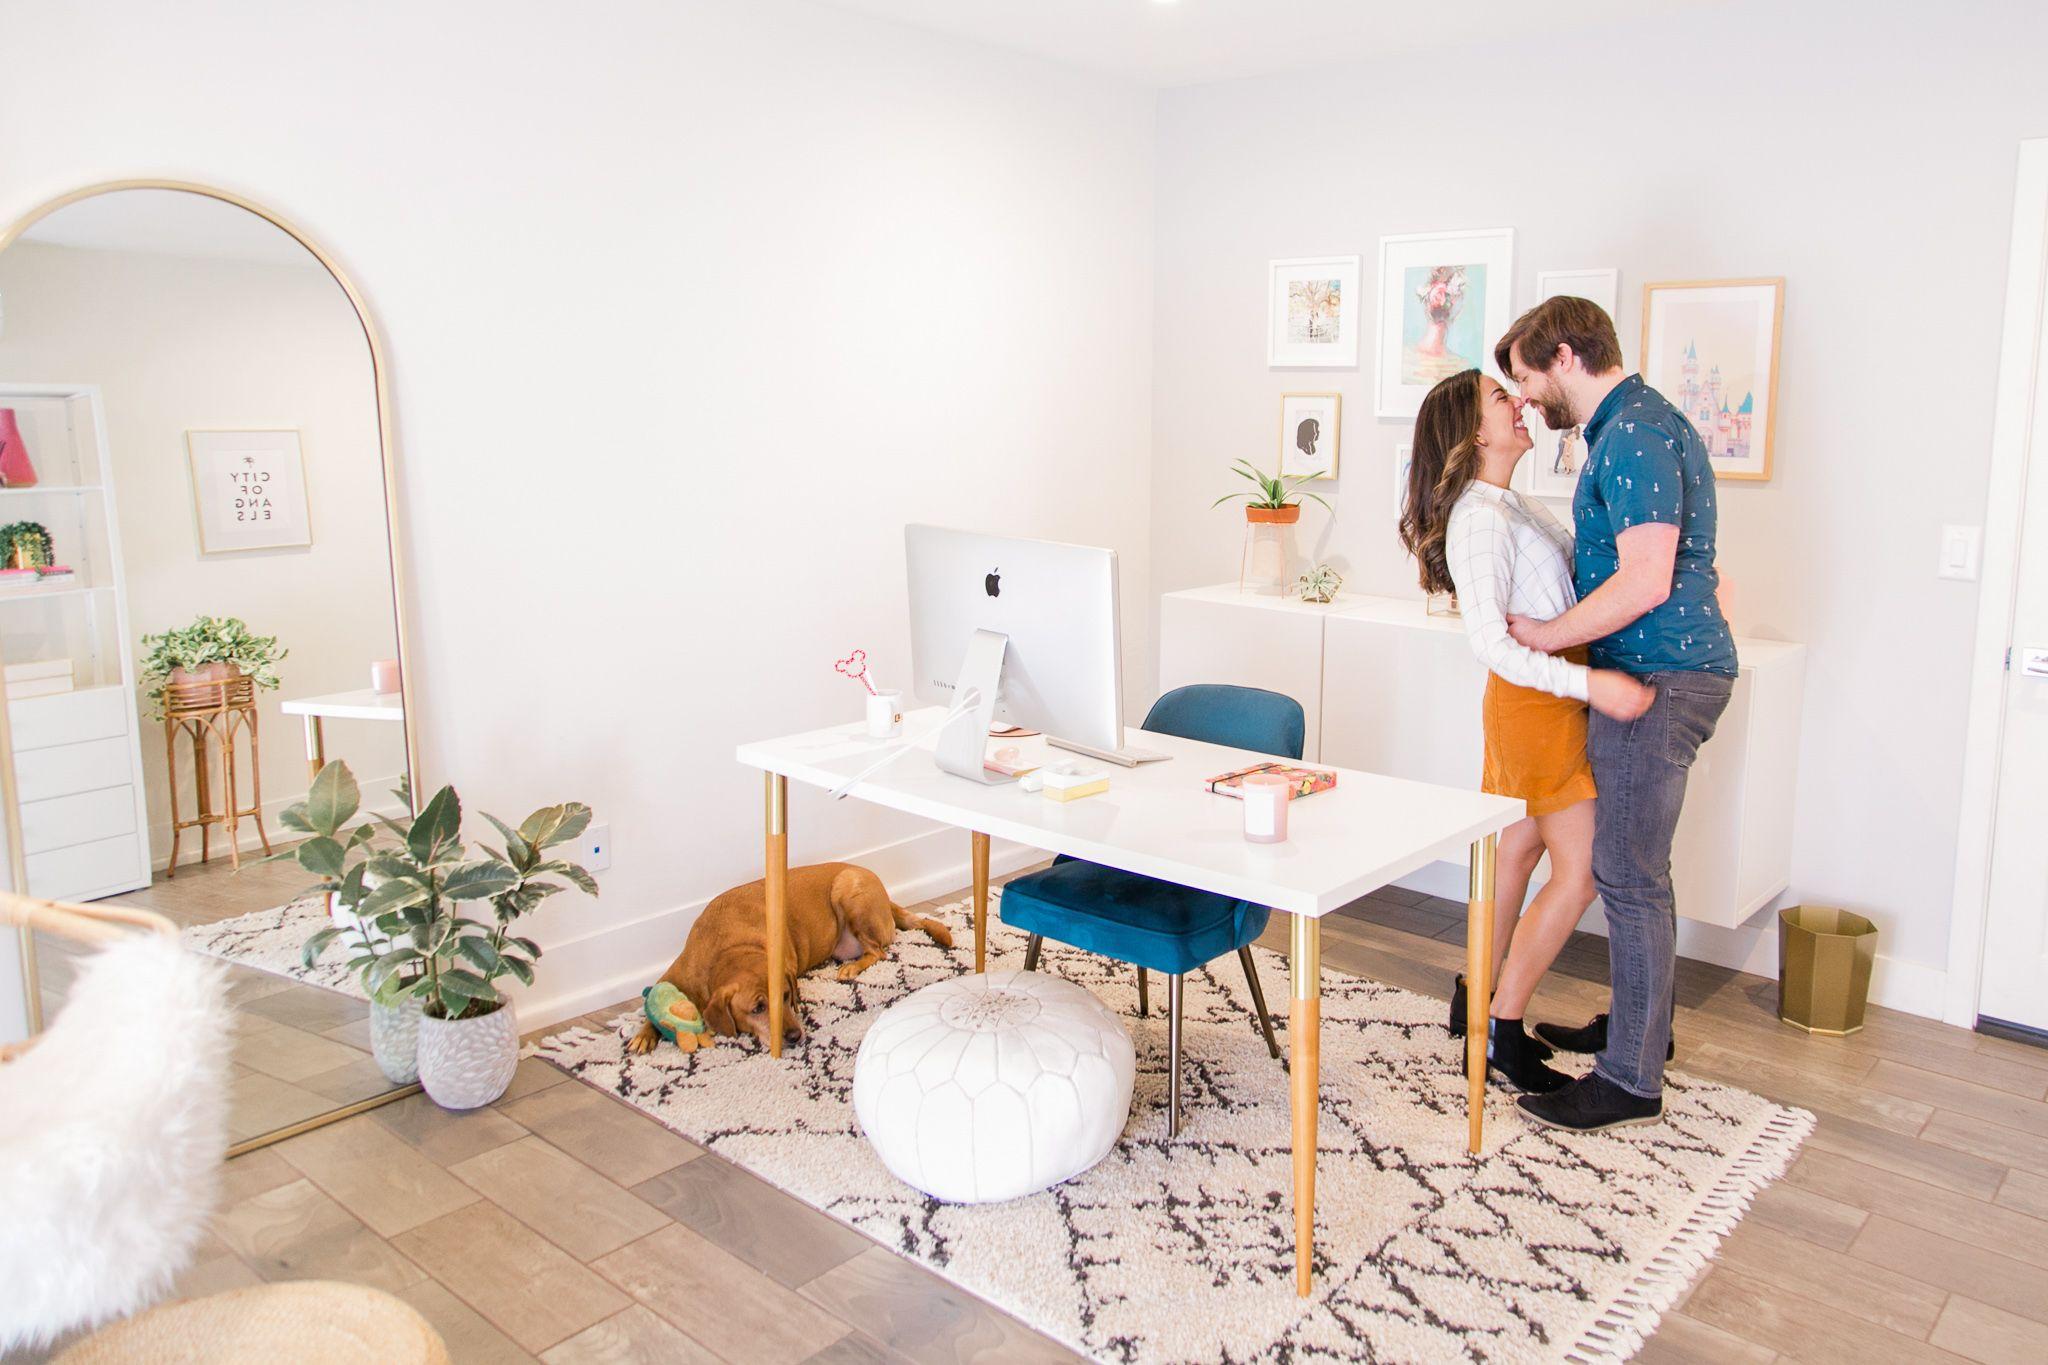 My Minimal California Inspired Home Office Emmygination Home Office Decor Home Office Design Home